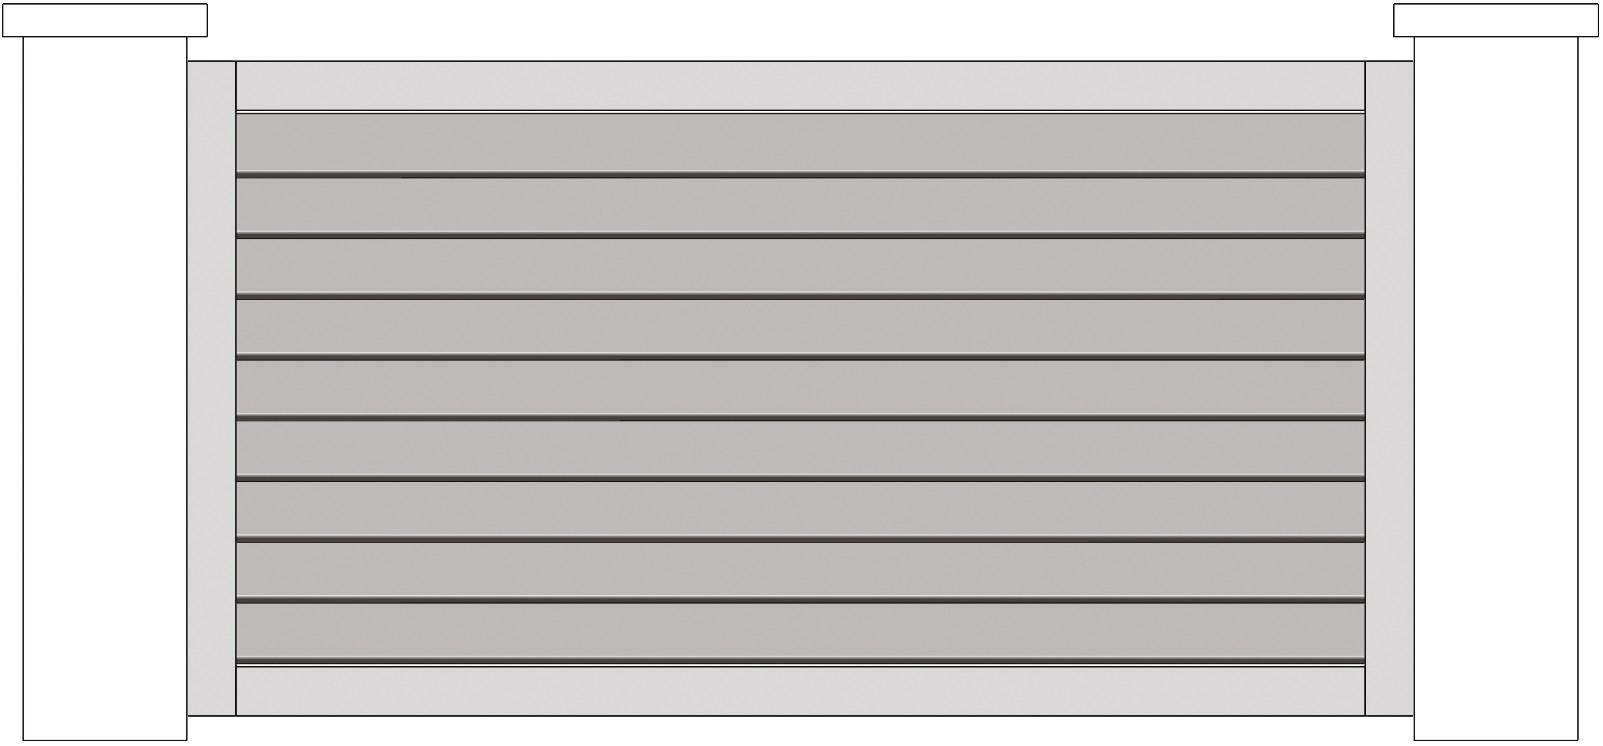 Clôture horizontale schéma